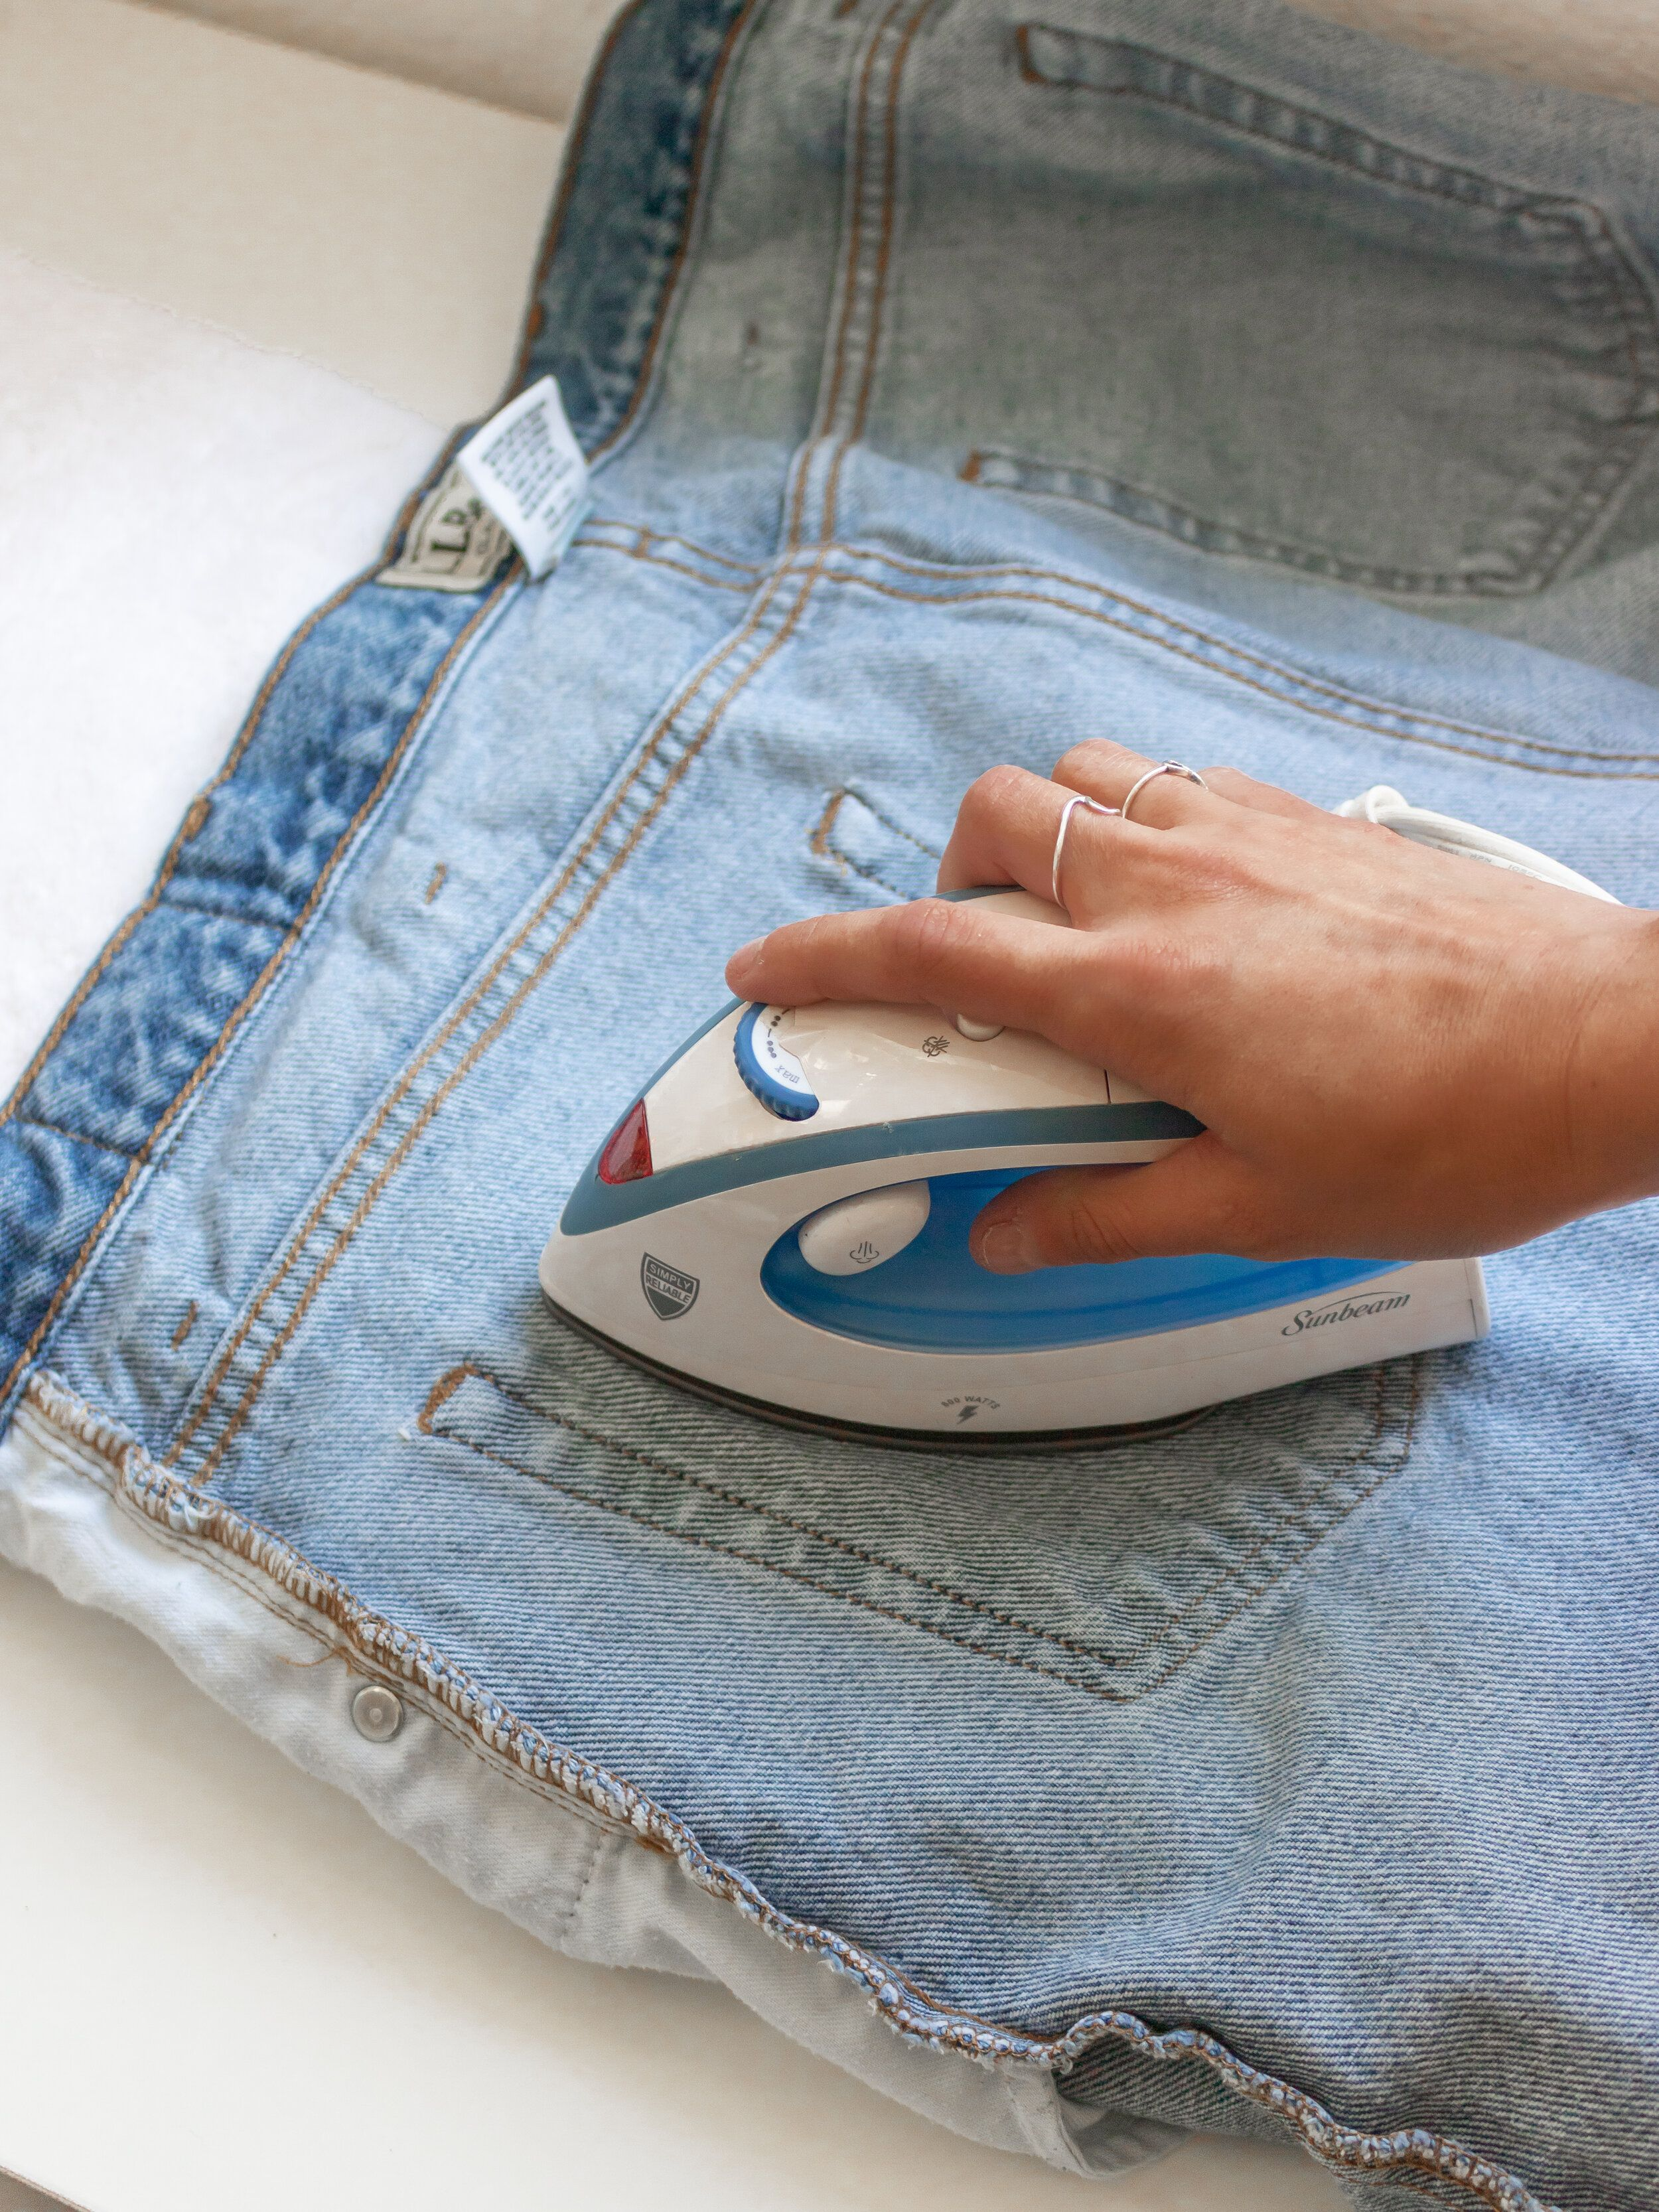 Denim painting 101 how to heatset painted jeans denim